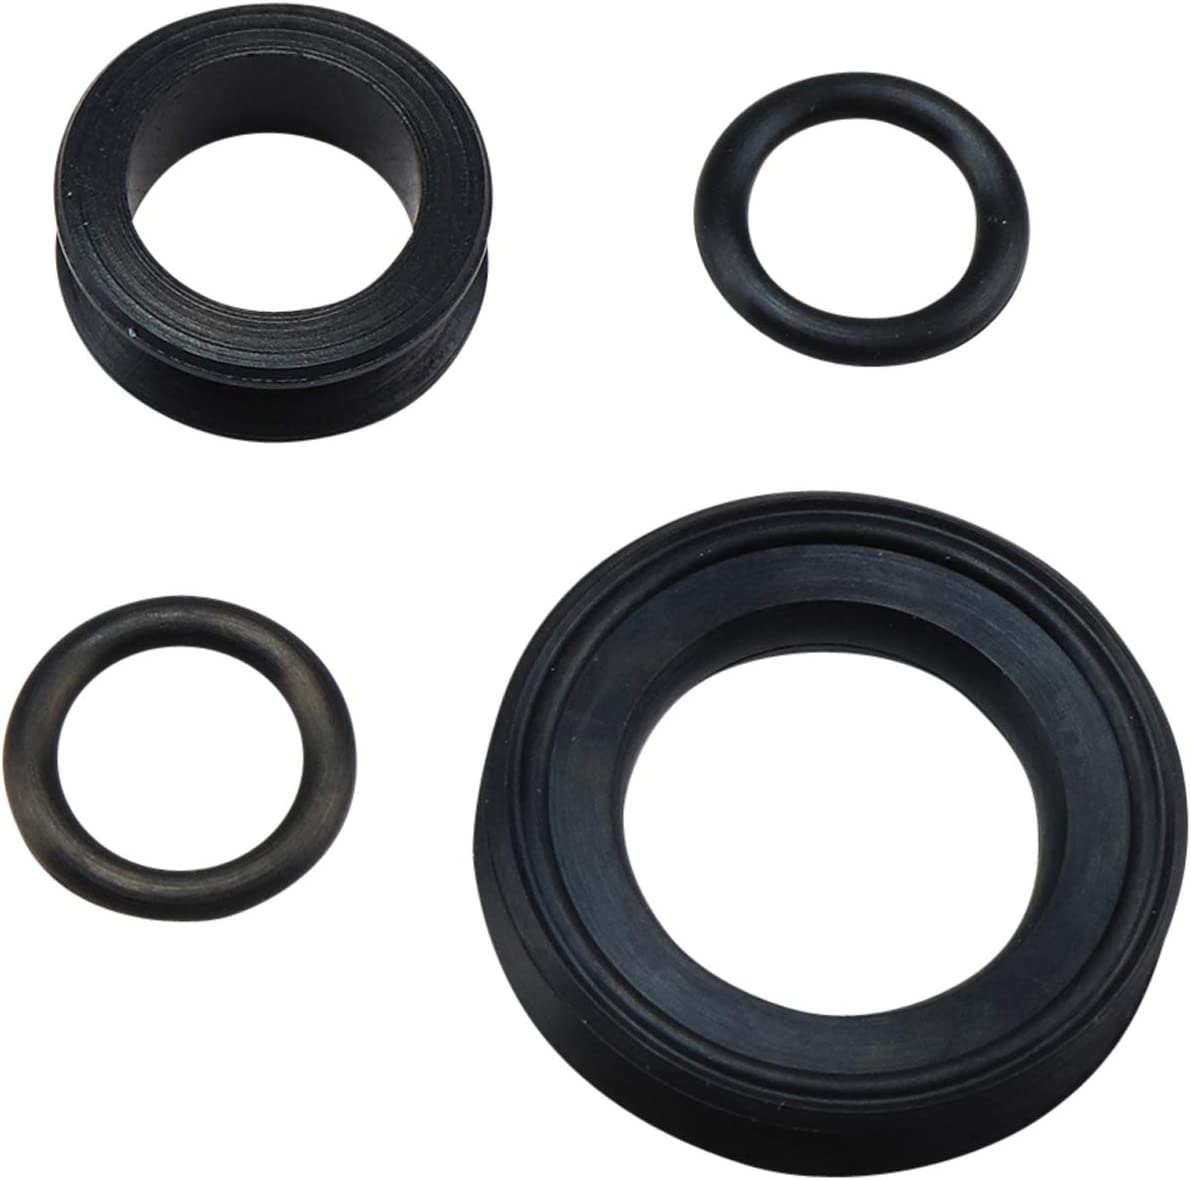 5-1//4 ID 5-7//16 OD 70 Durometer Hardness Pack of 50 5-1//4 ID 5-7//16 OD Pack of 50 Sterling Seal ORVT160x50 Viton Number-160 Standard O-Ring Sur-Seal Fluoropolymer Elastomer